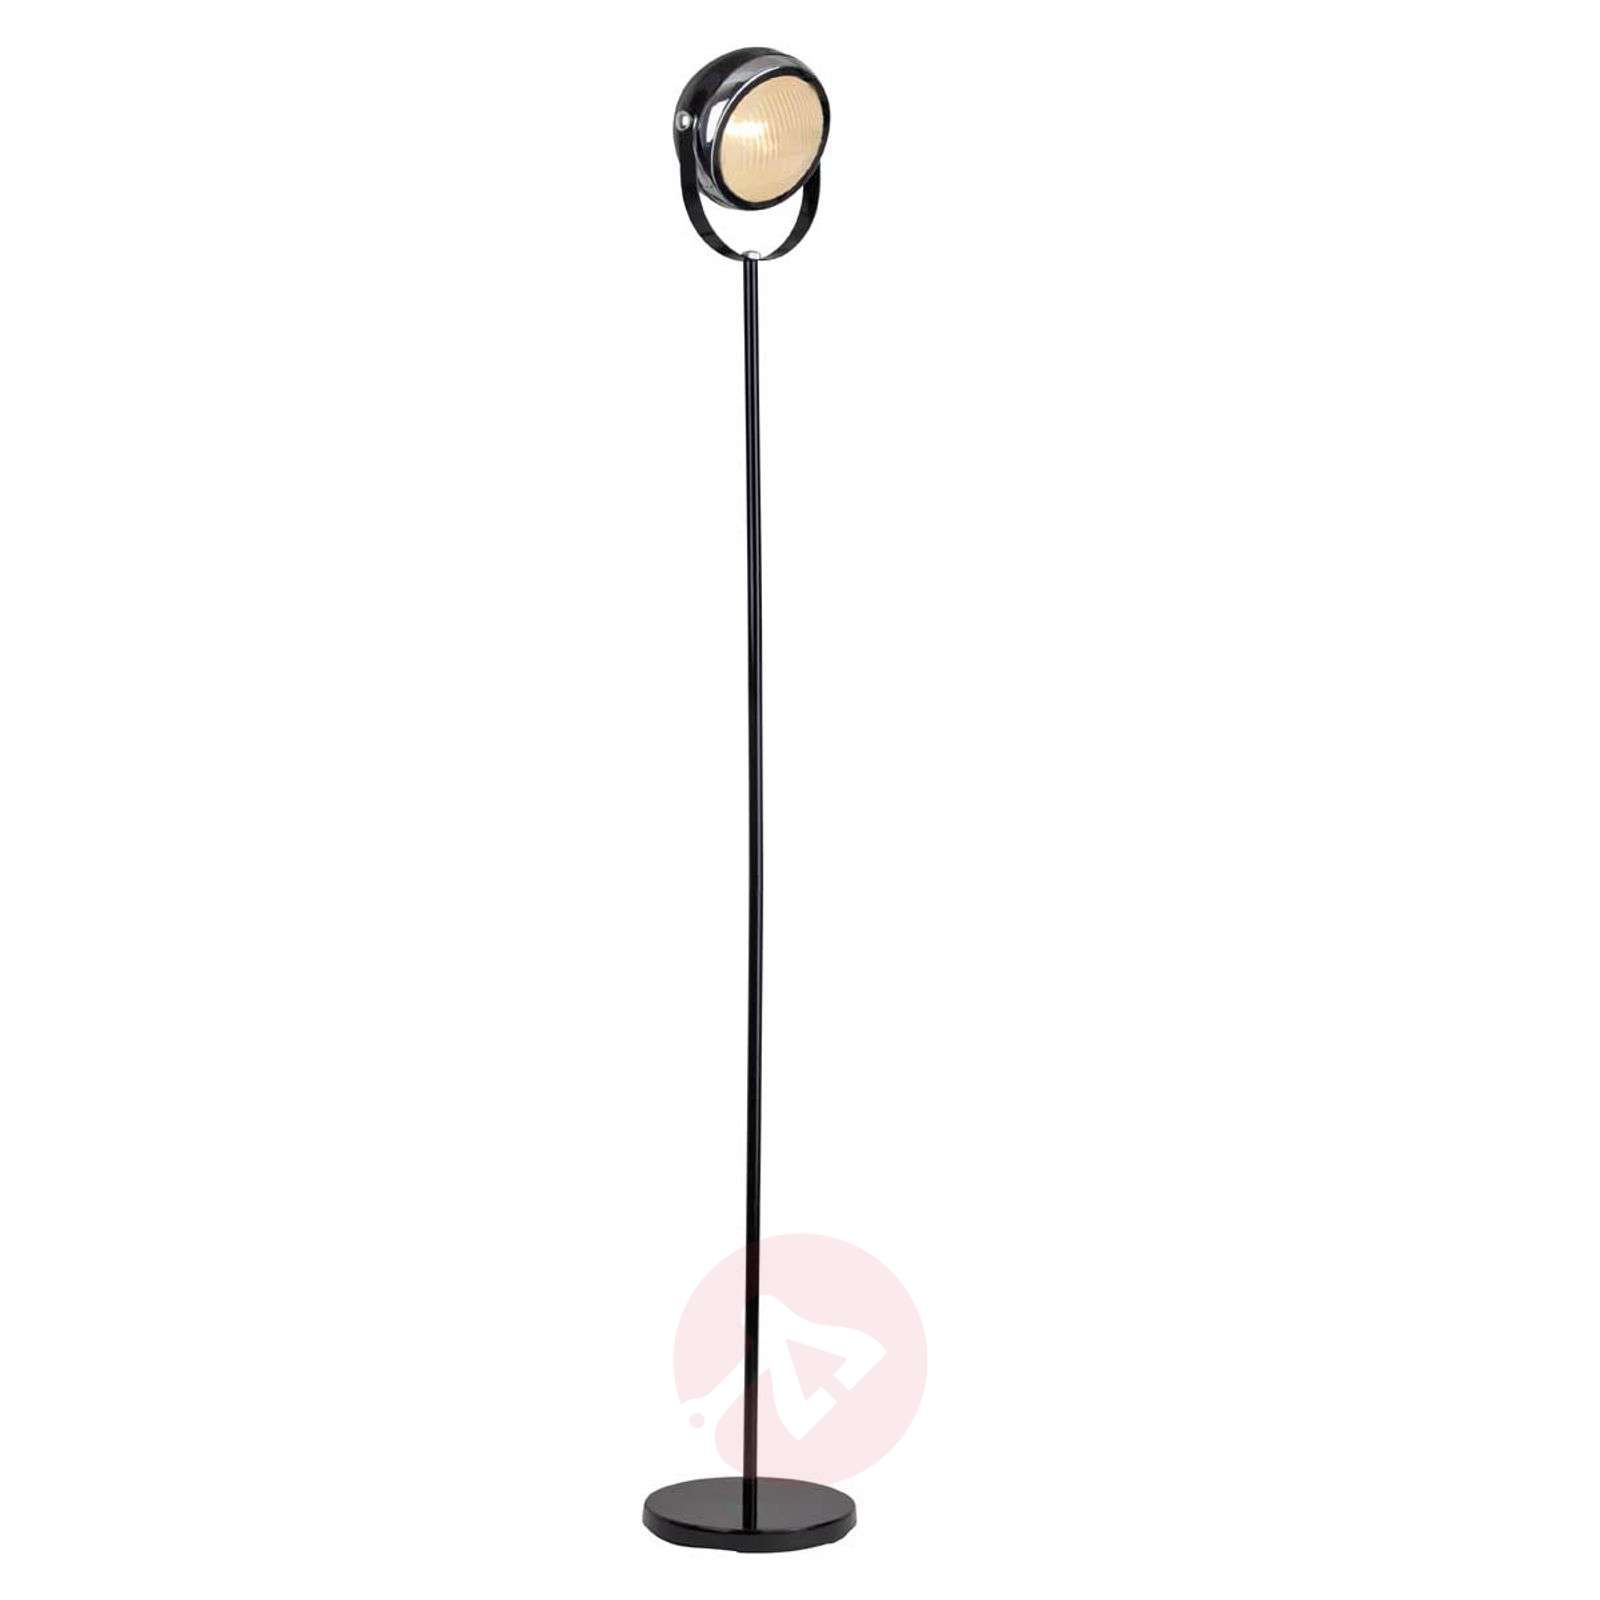 RIDER-lattiavalaisin spotilla, musta-1507174-01